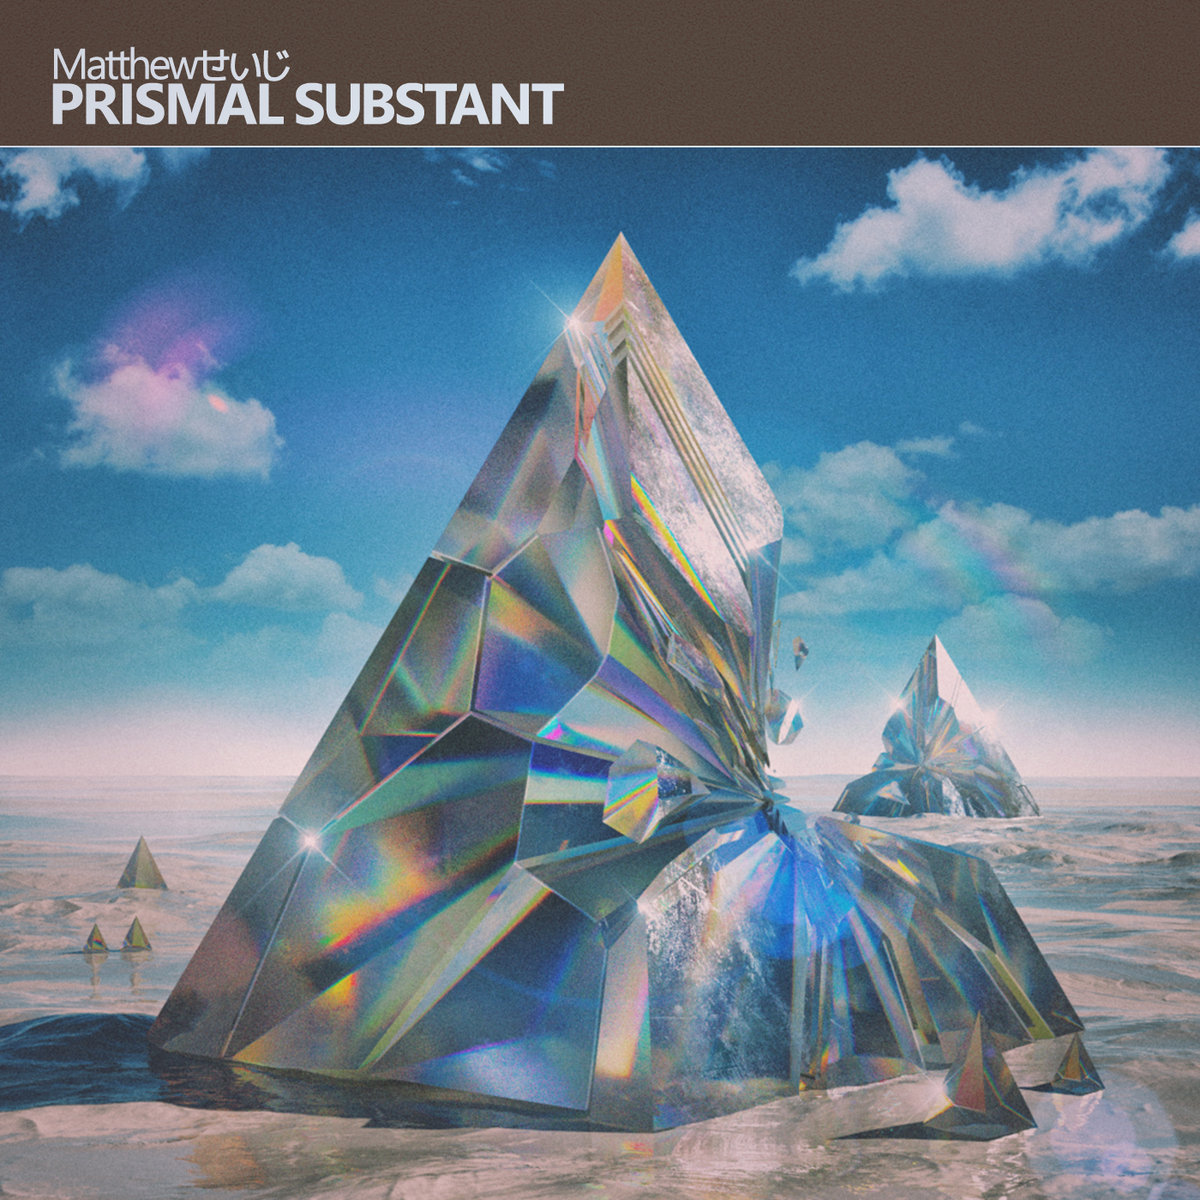 PRISMAL SUBSTANT